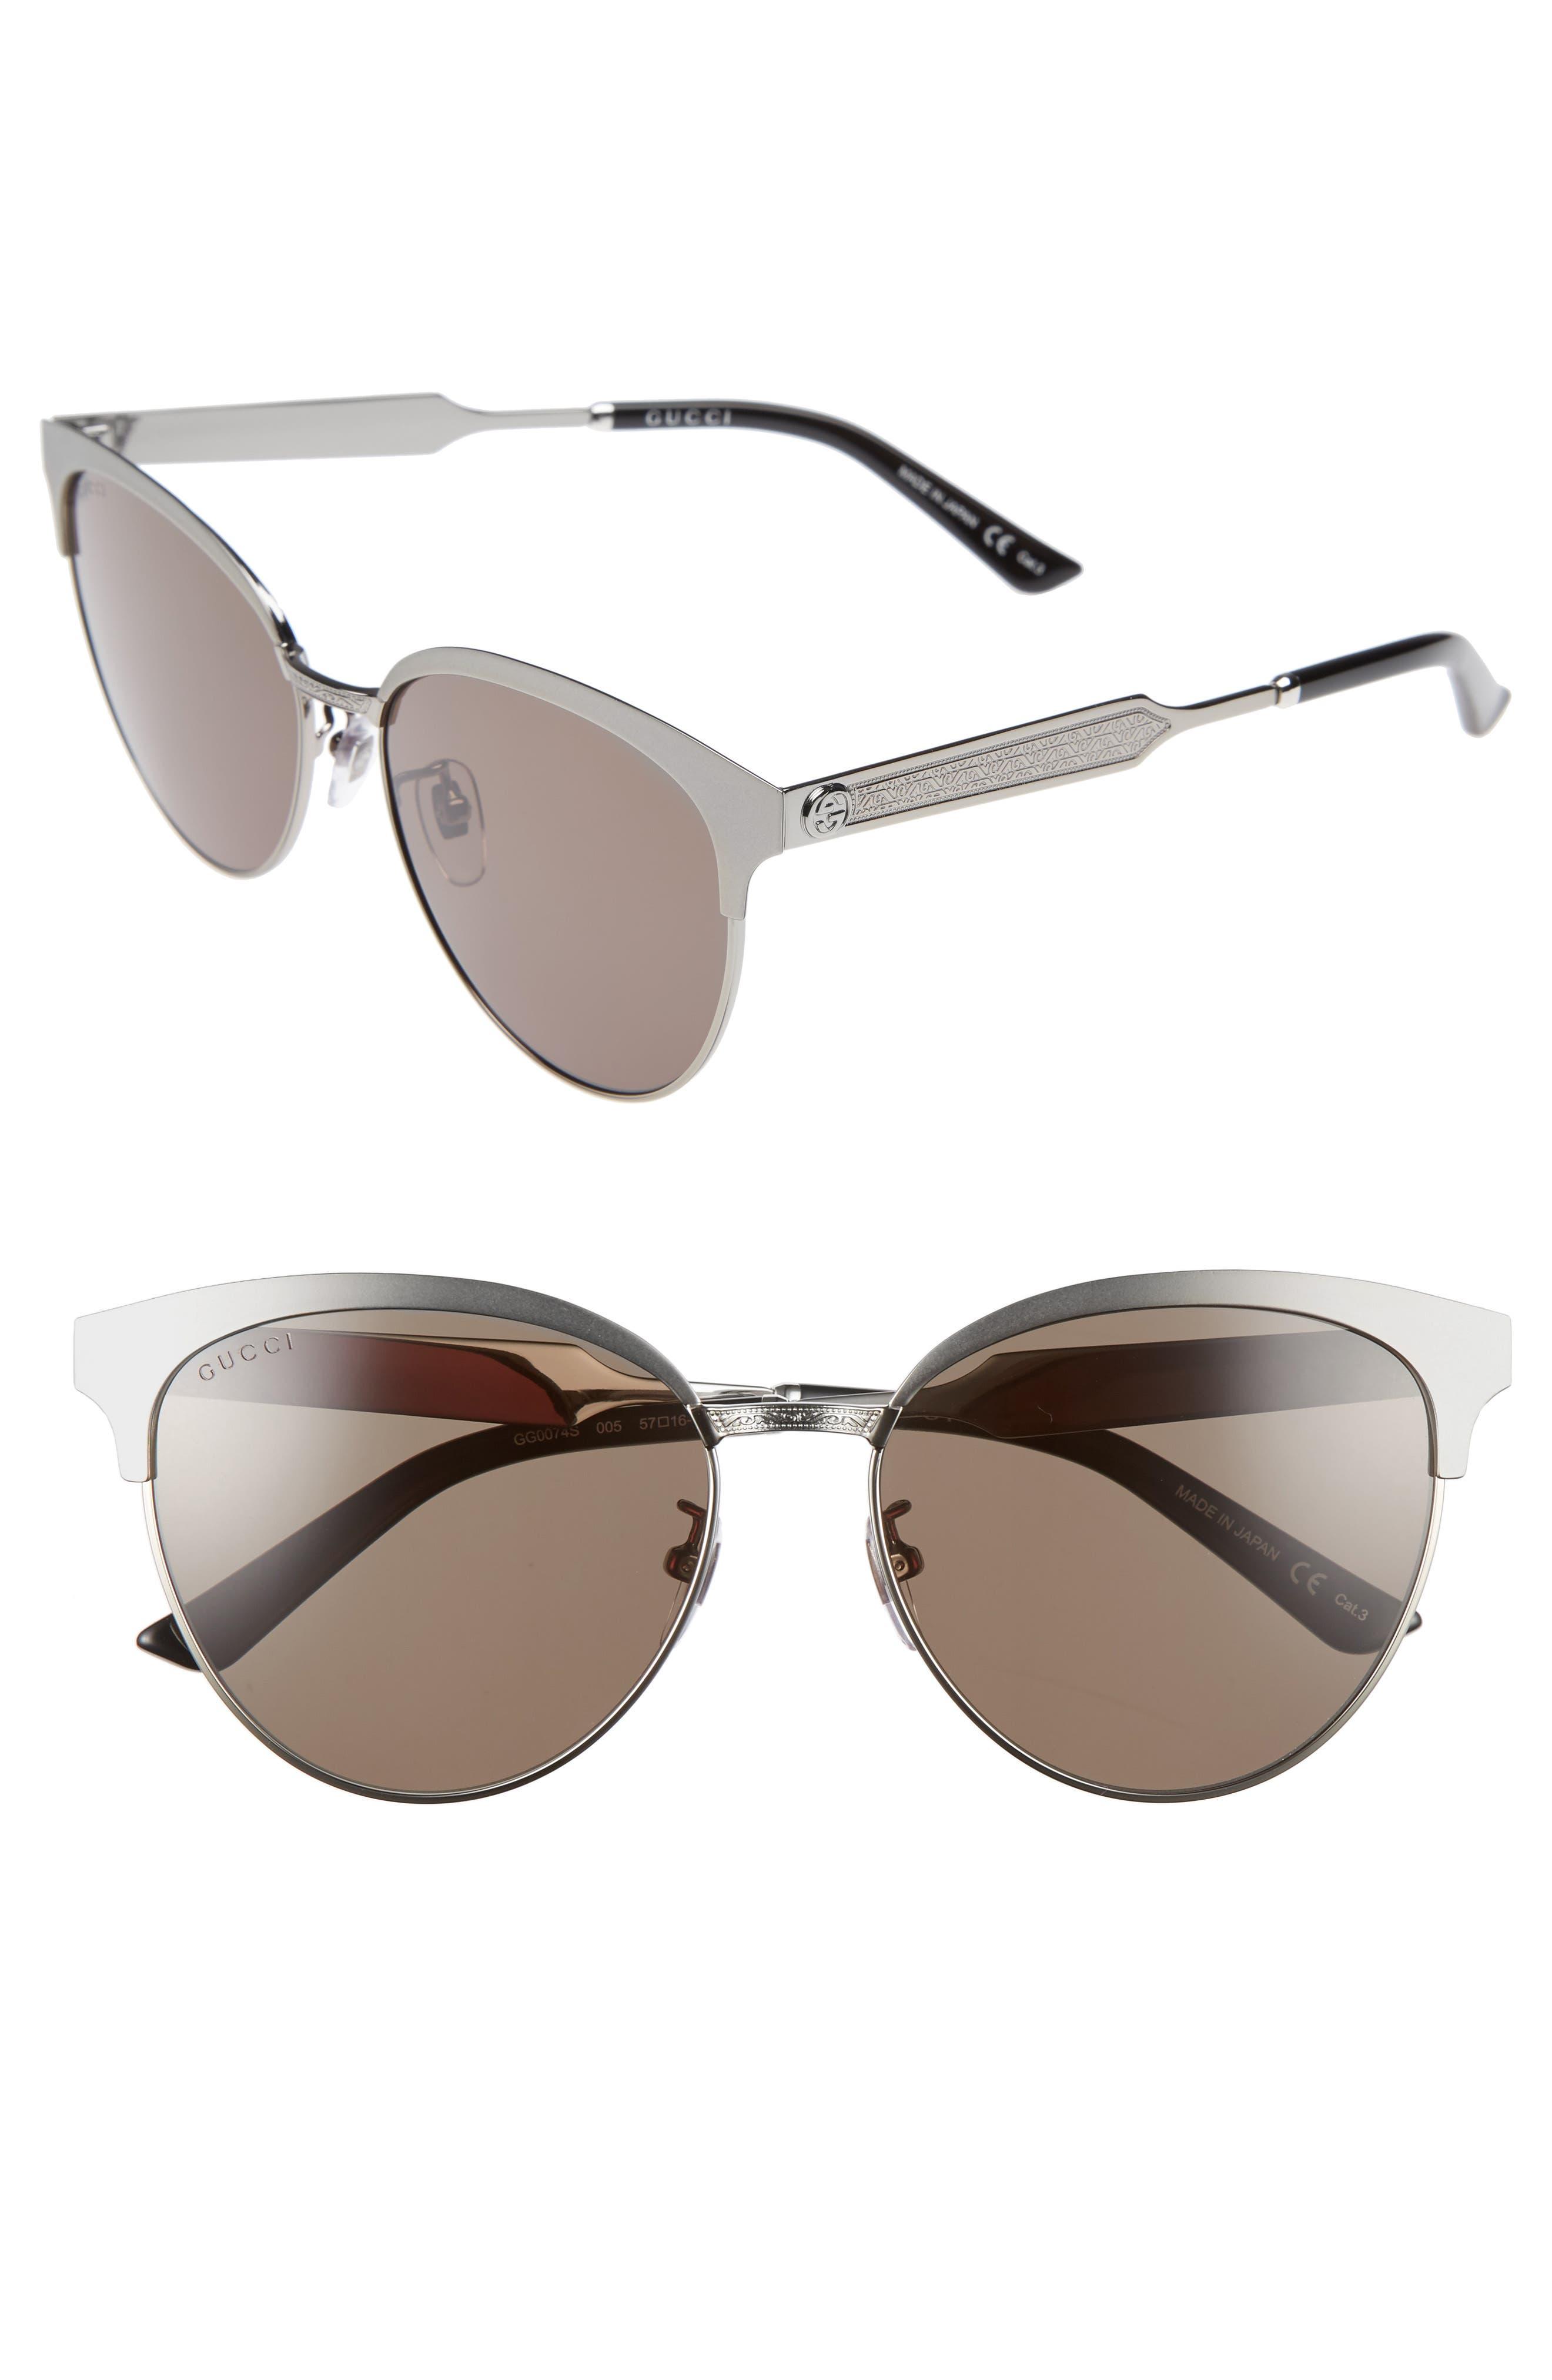 57mm Retro Sunglasses,                             Main thumbnail 1, color,                             Ruthenium/ Green